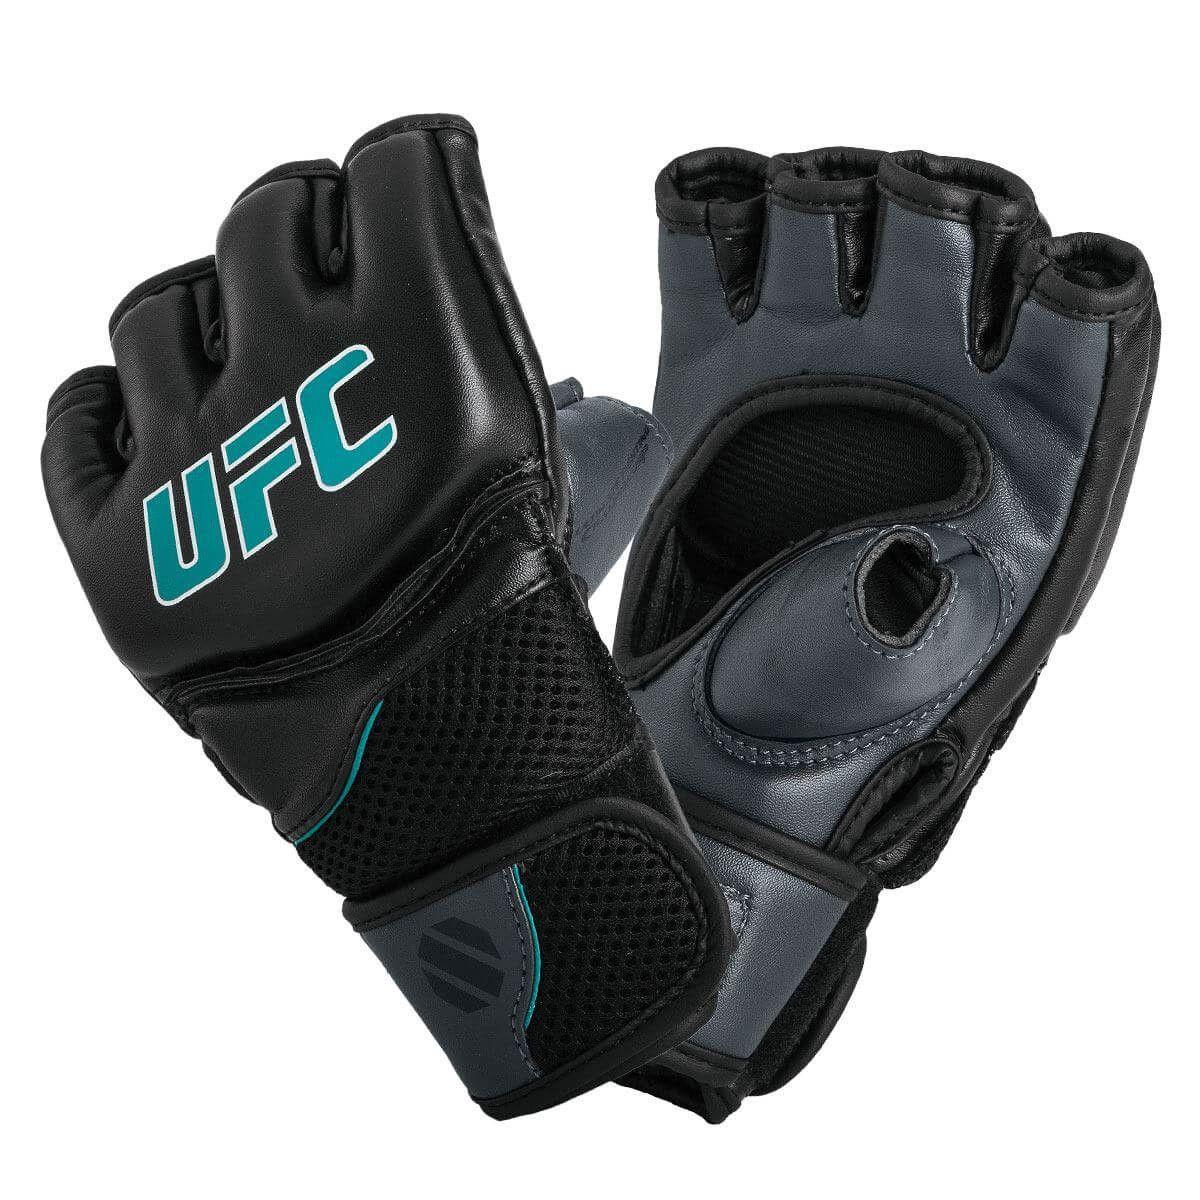 UFC Women's Competition MMA Gloves Mma gloves, Ufc women